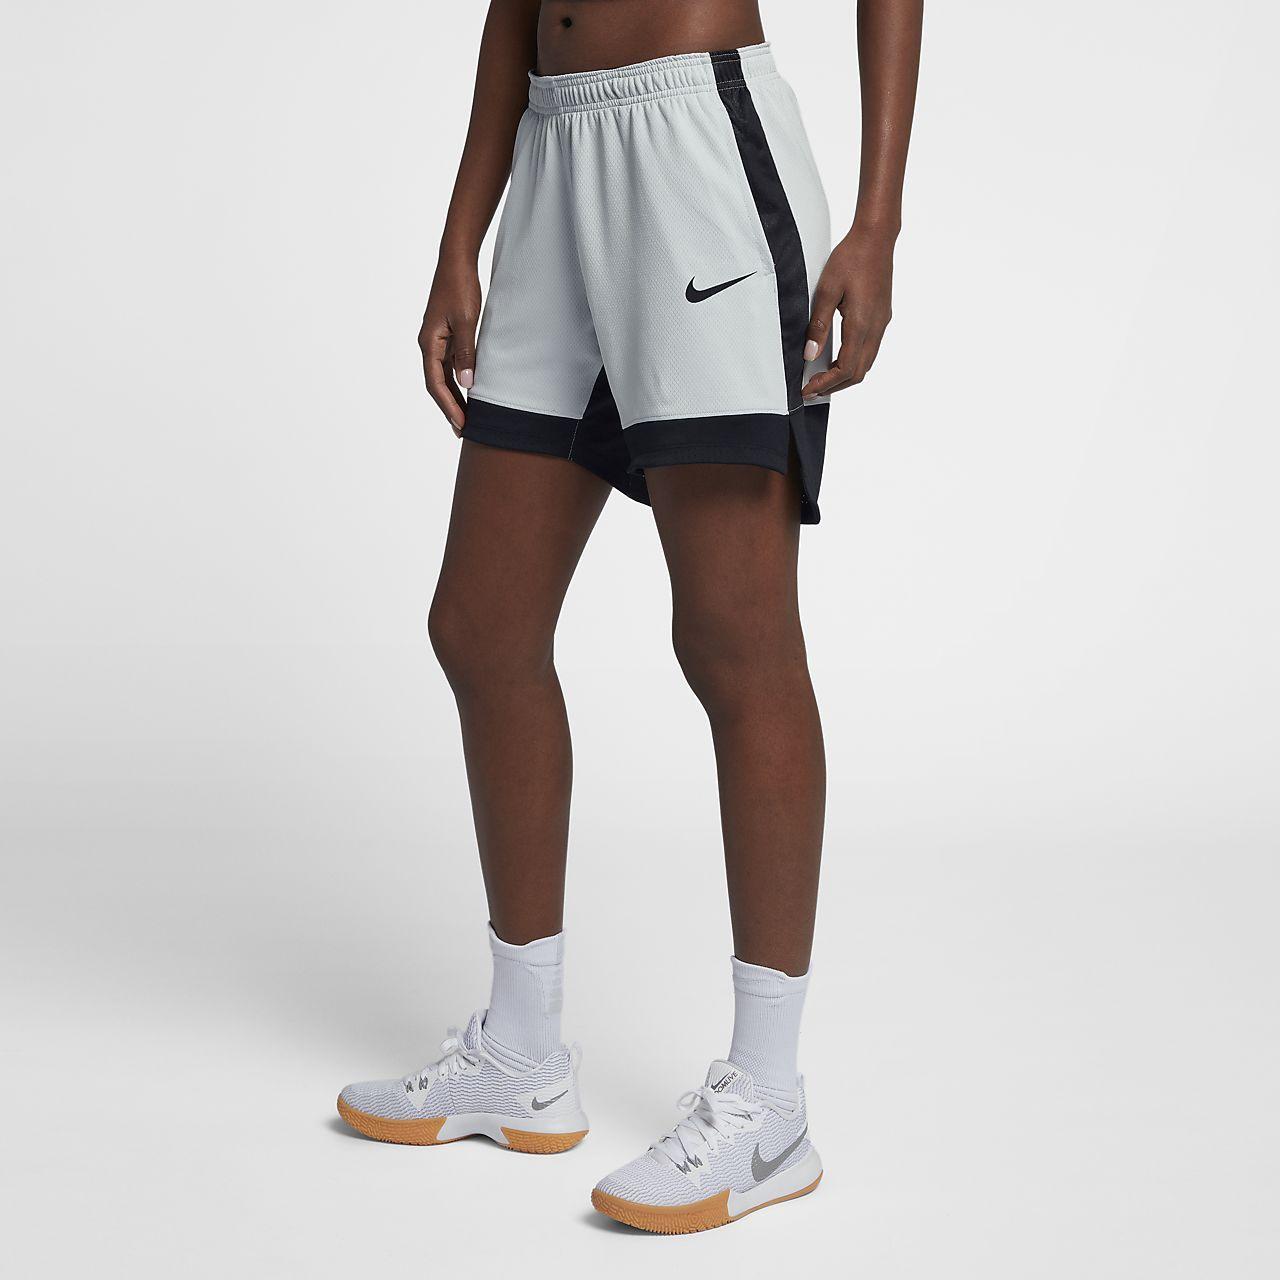 Nike Dri Fit Elite Women S 7 Basketball Shorts Basketball Clothes Retro High Waisted Bikini Summer Gym Outfits